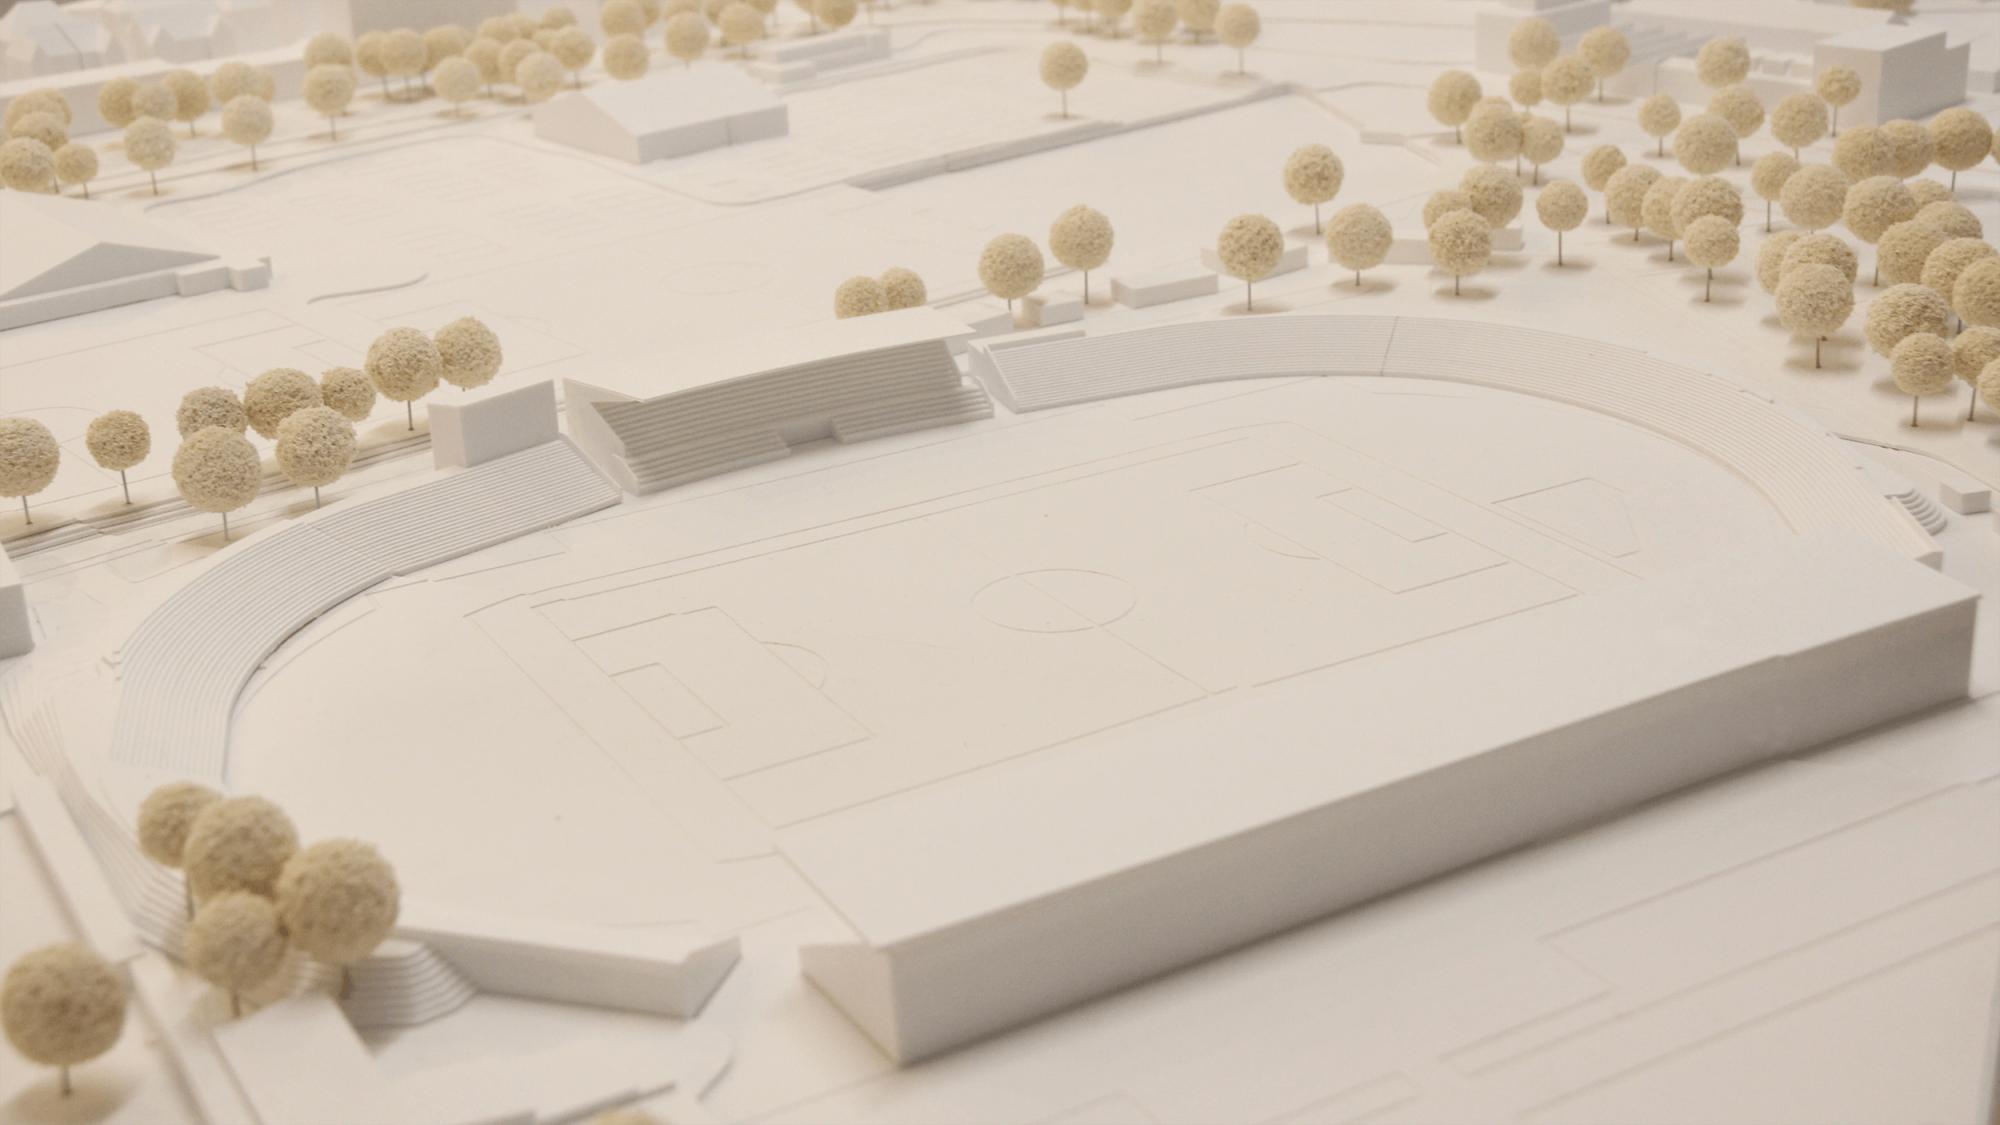 SSV Ulm Architekturmodell Modellbau Weiß